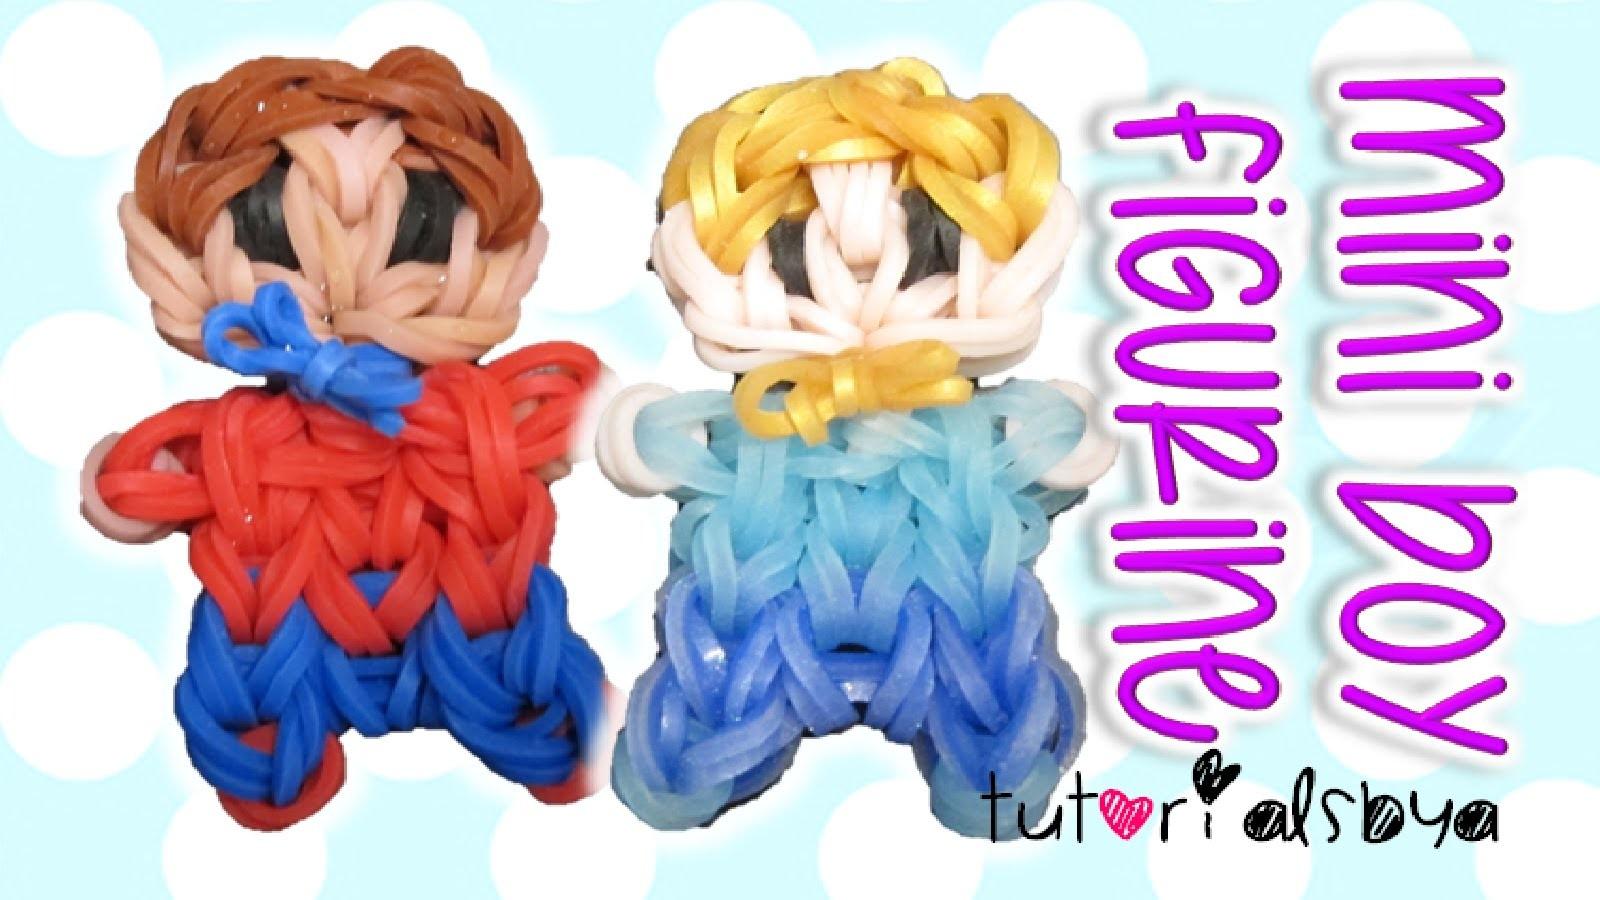 Cute Mini Baby Boy Person Charm. Figurine Rainbow Loom Tutorial | How To